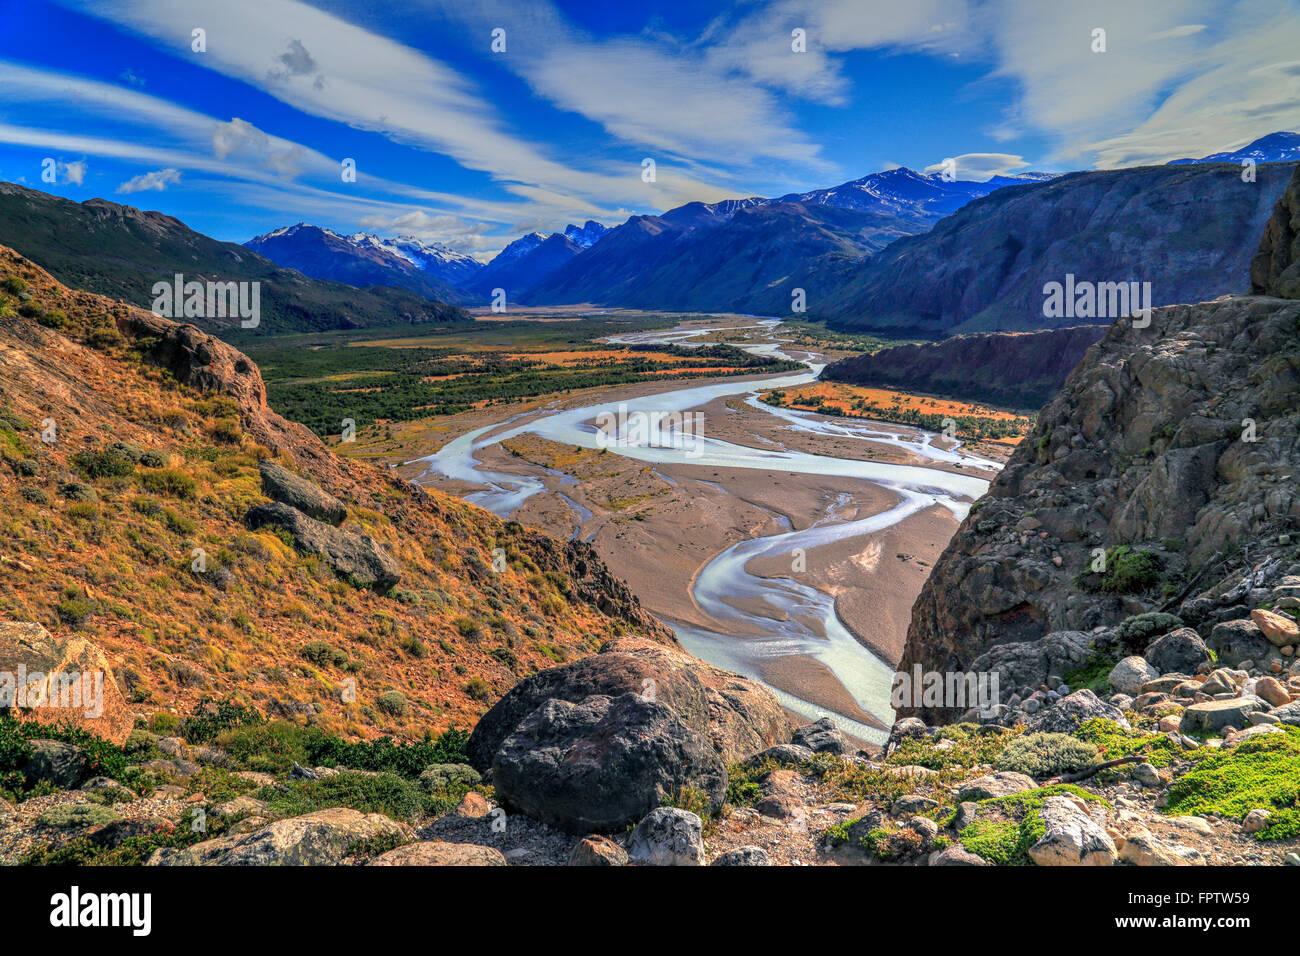 El Chalten, Santa Cruz, Patagonia Argentina Immagini Stock